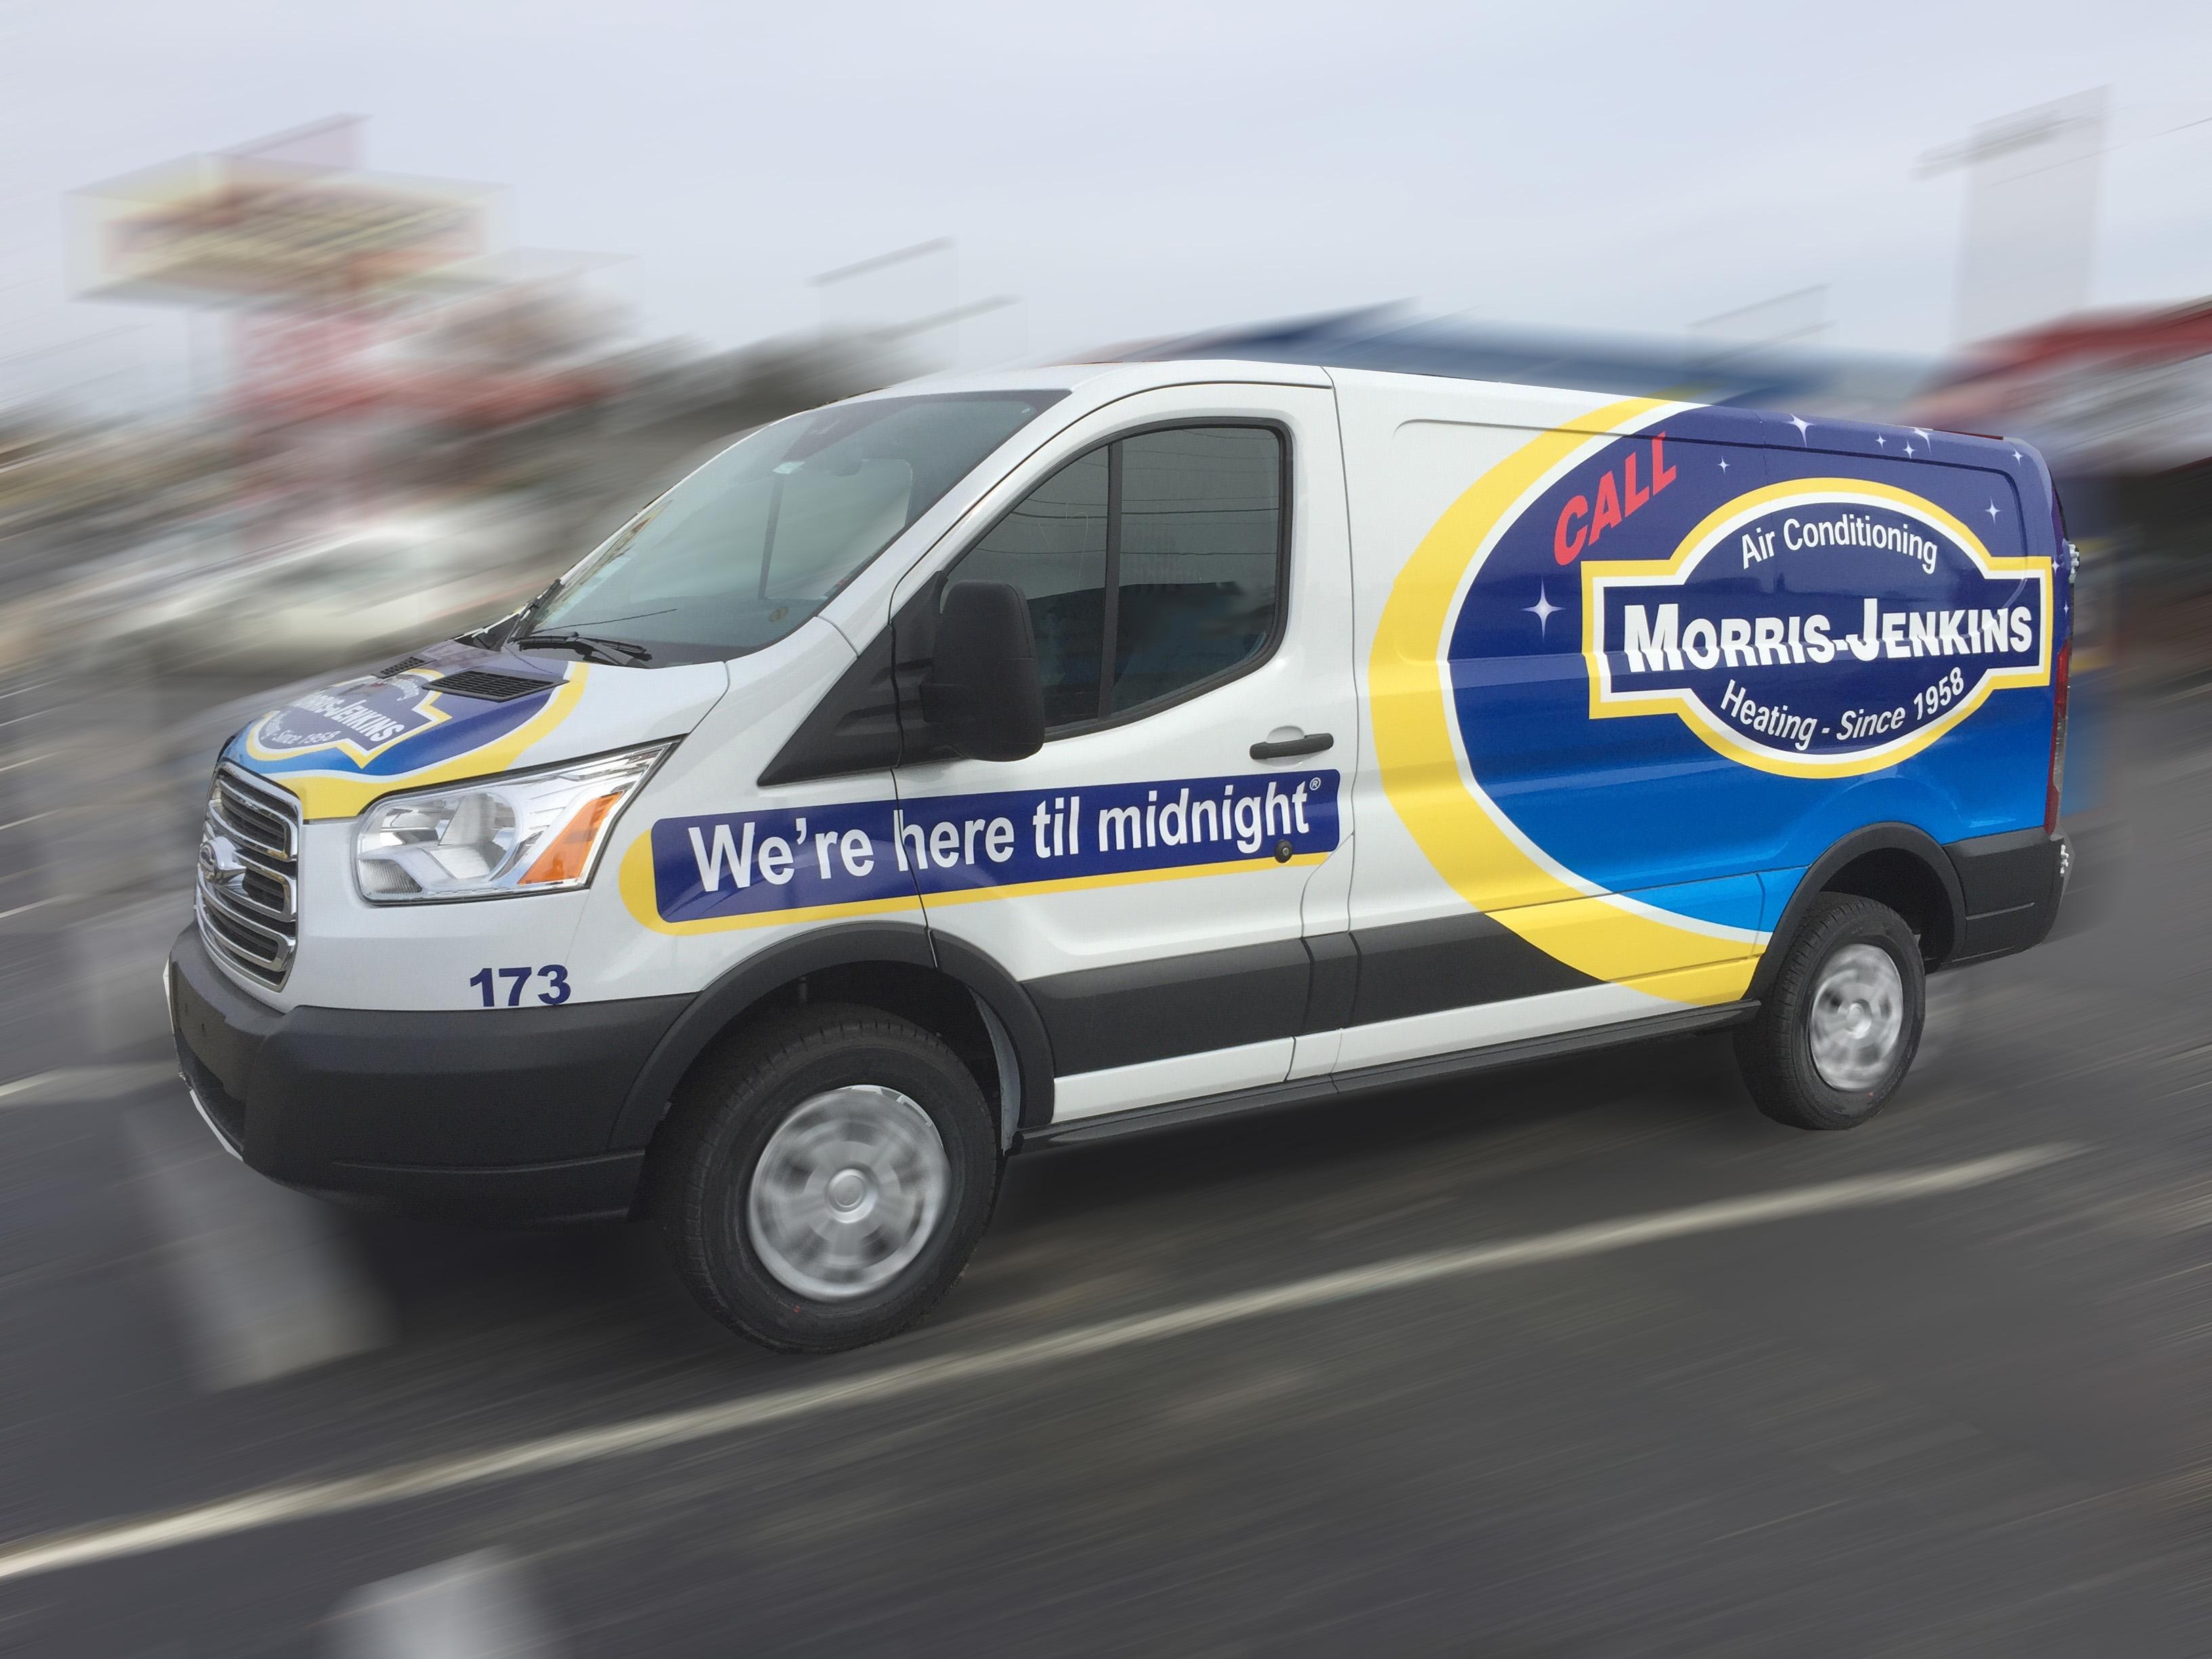 Kranken Signs Vehicle Wraps Charlotte image 6